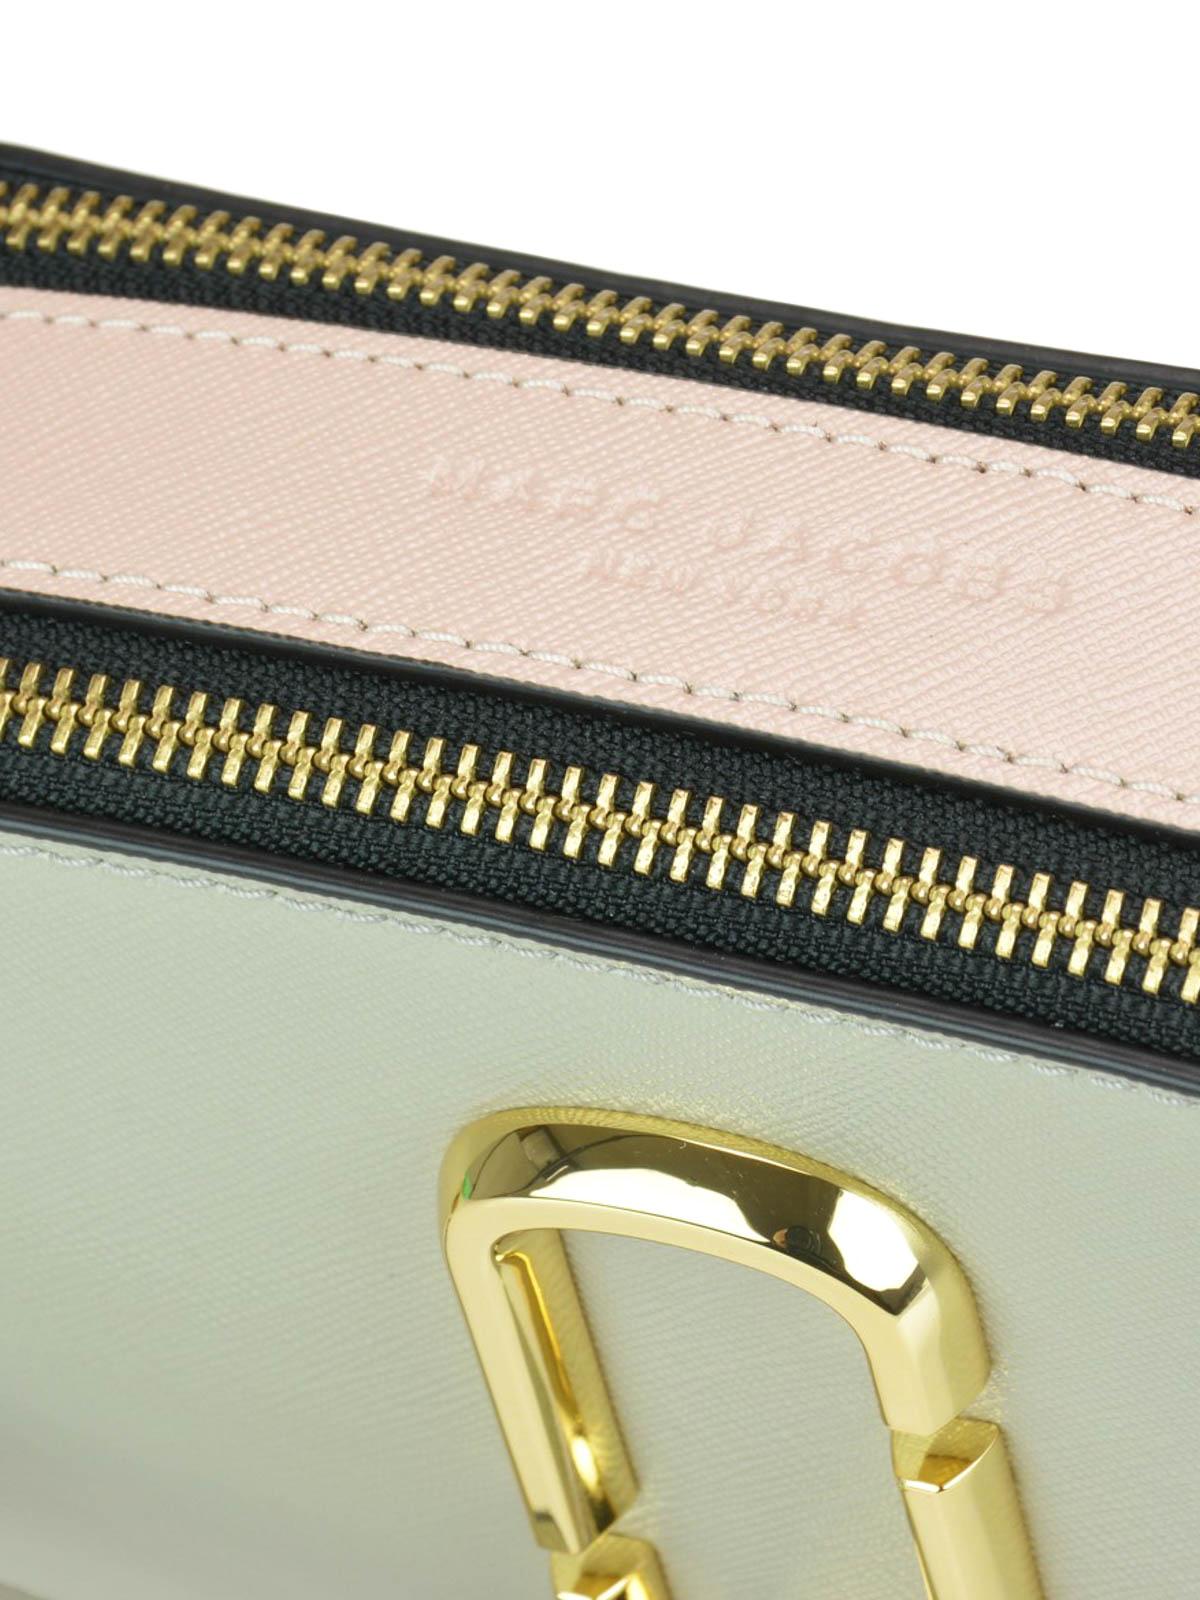 aefa25c3425 Marc Jacobs - Snapshot saffiano leather camera bag - cross body bags ...